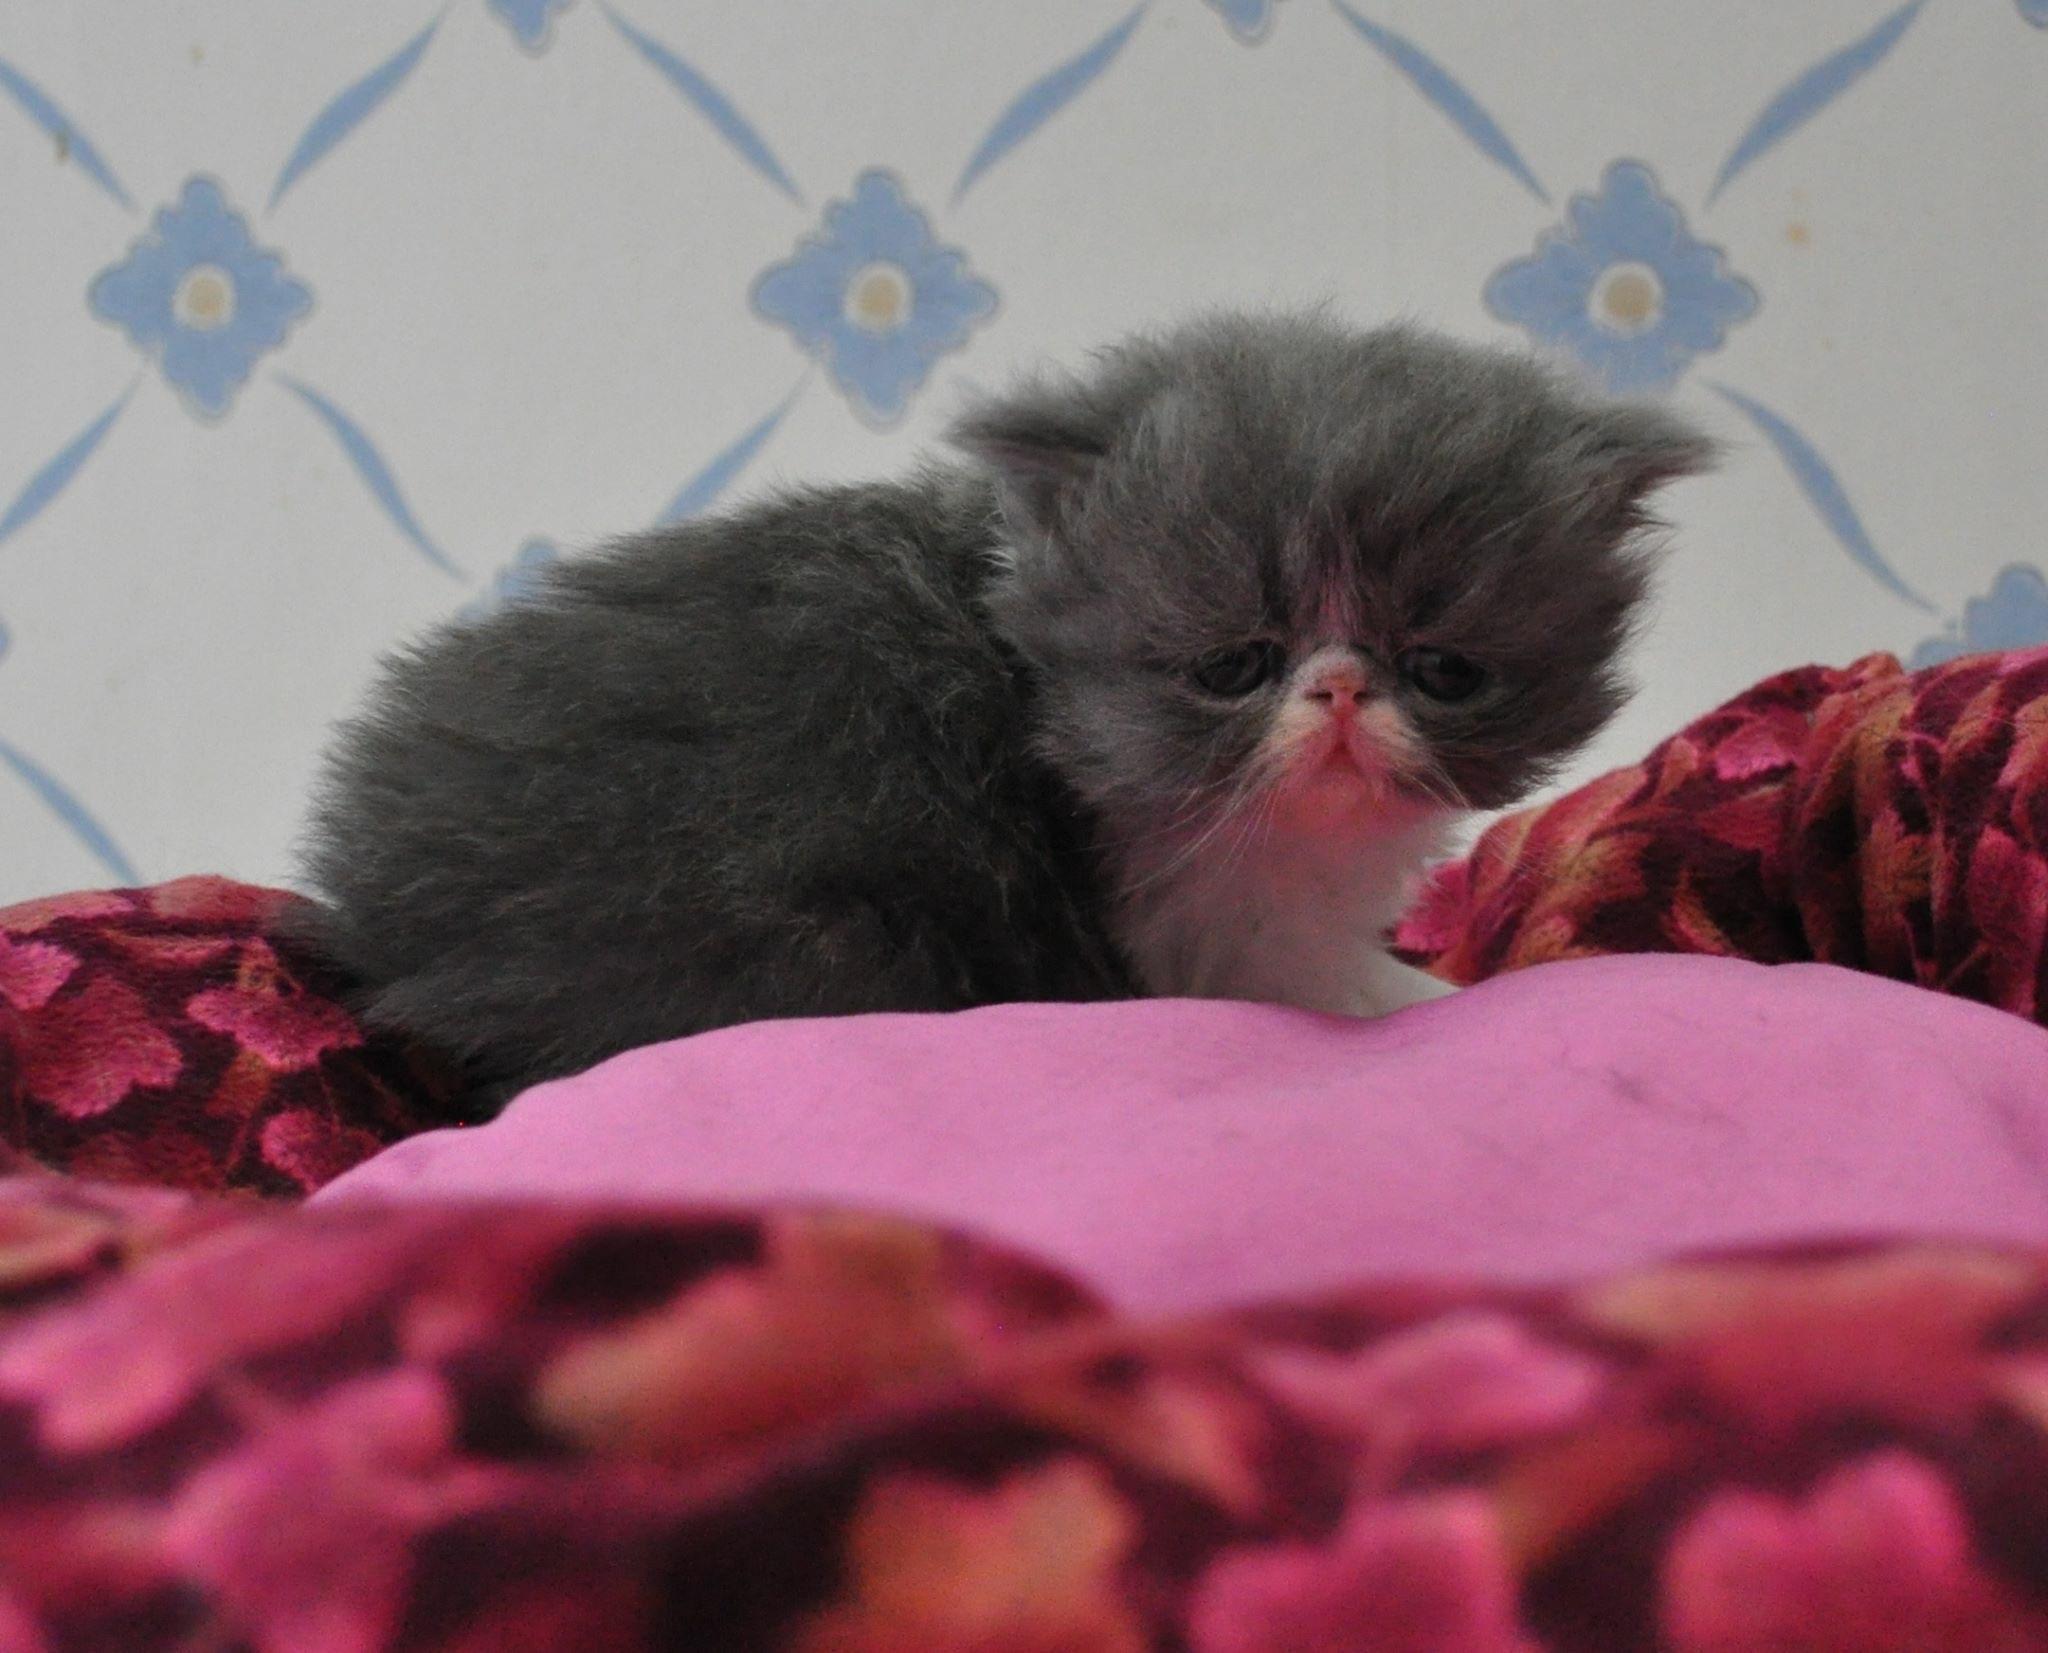 kattungar bortskänkes göteborg